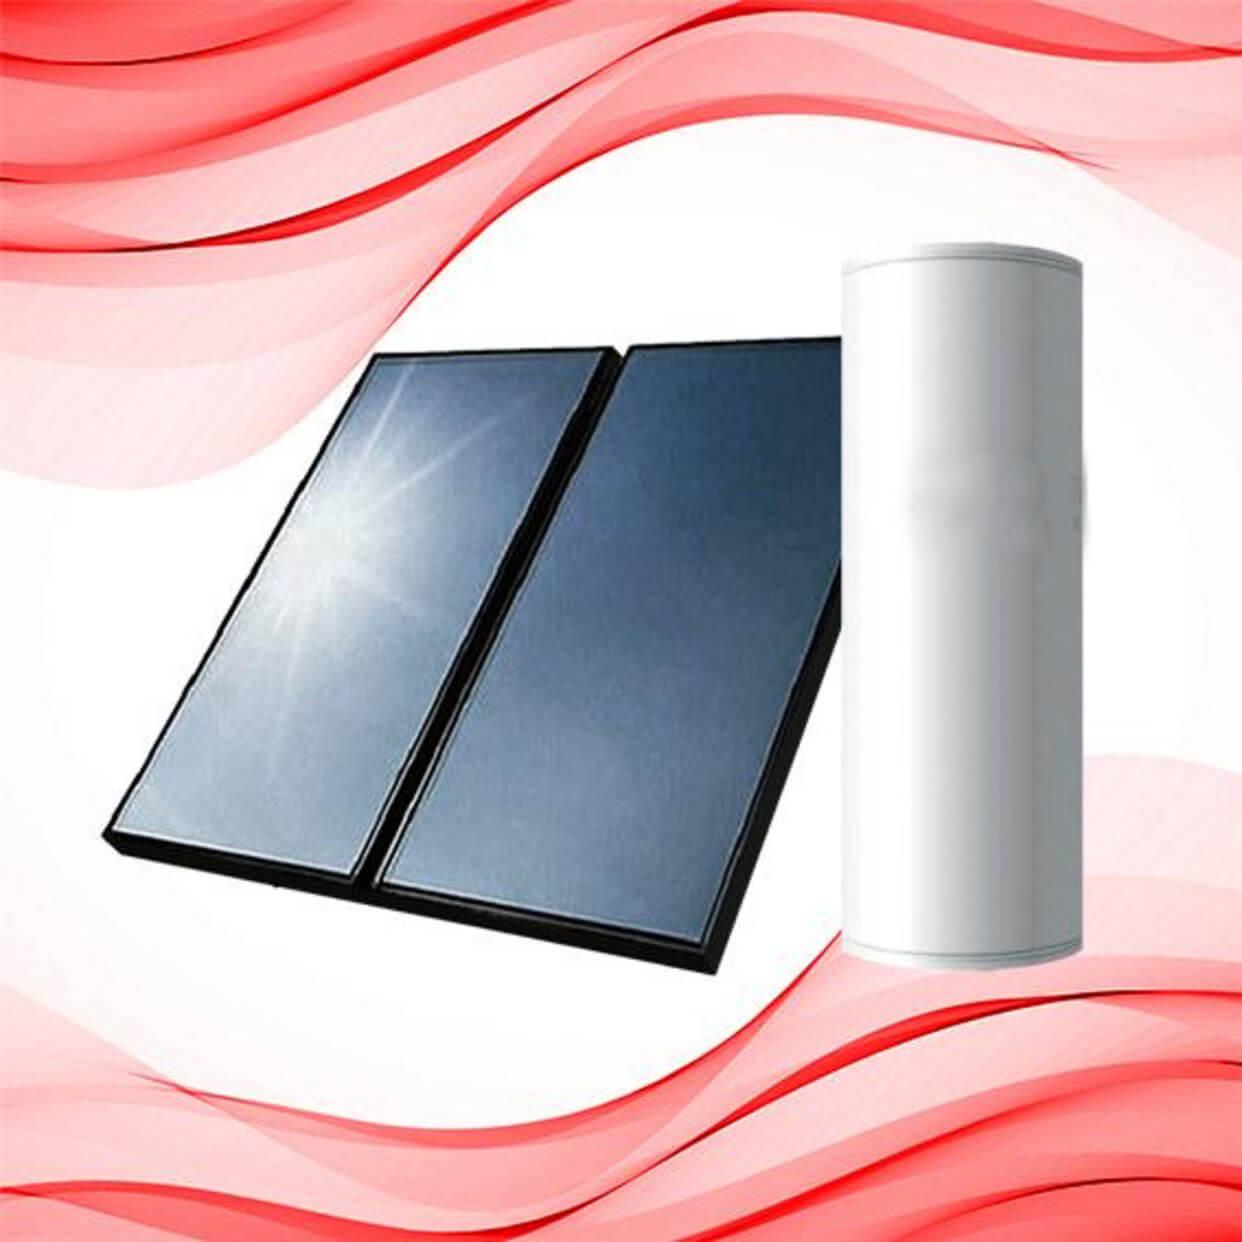 solarflatplatesolarwaterheater